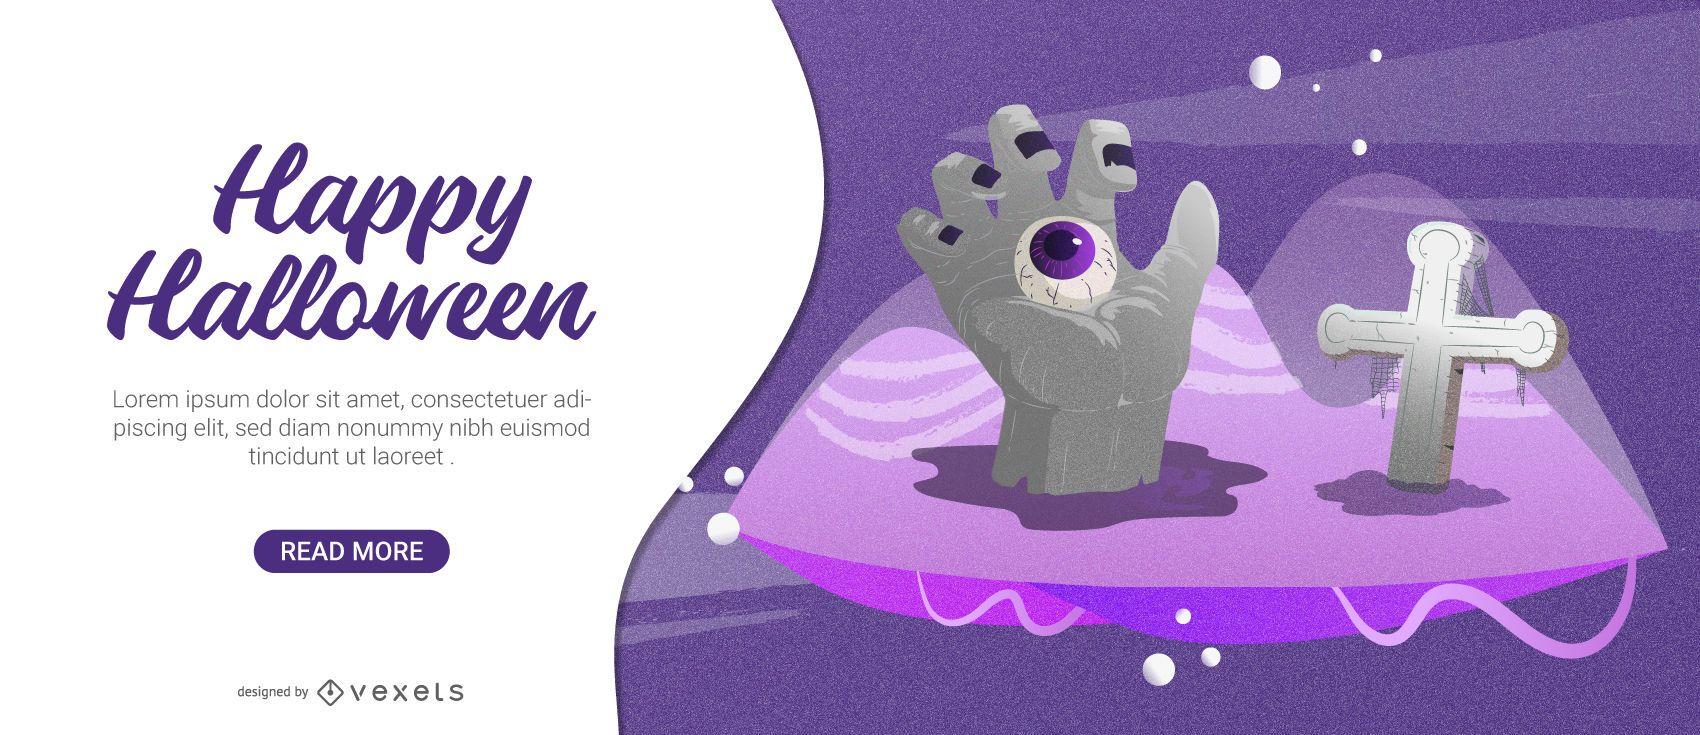 Spooky Halloween card design